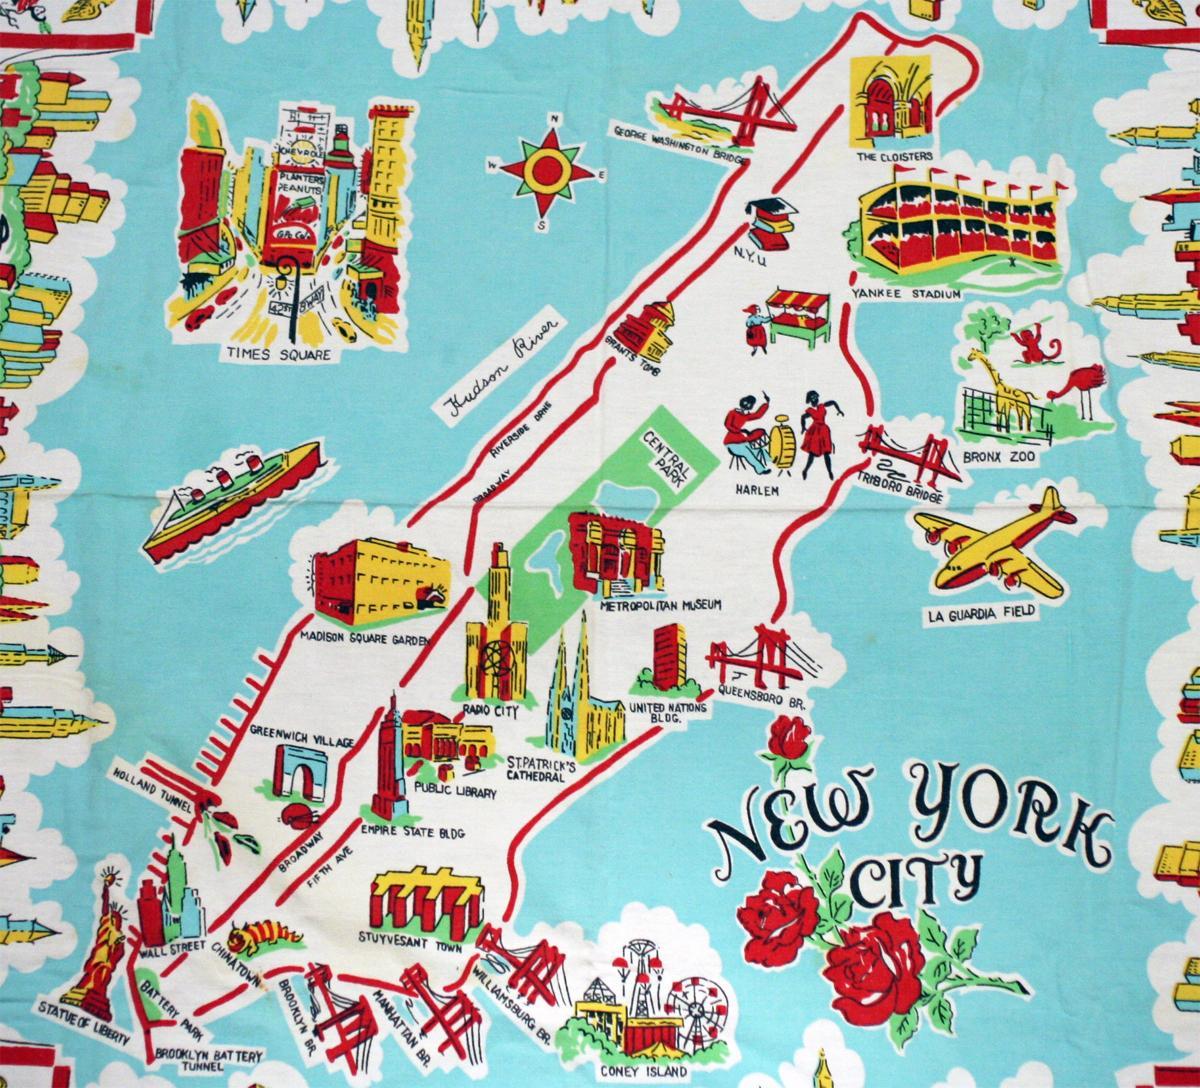 Nyc Attraktion Kort Kort Over New York Der Viser Turist